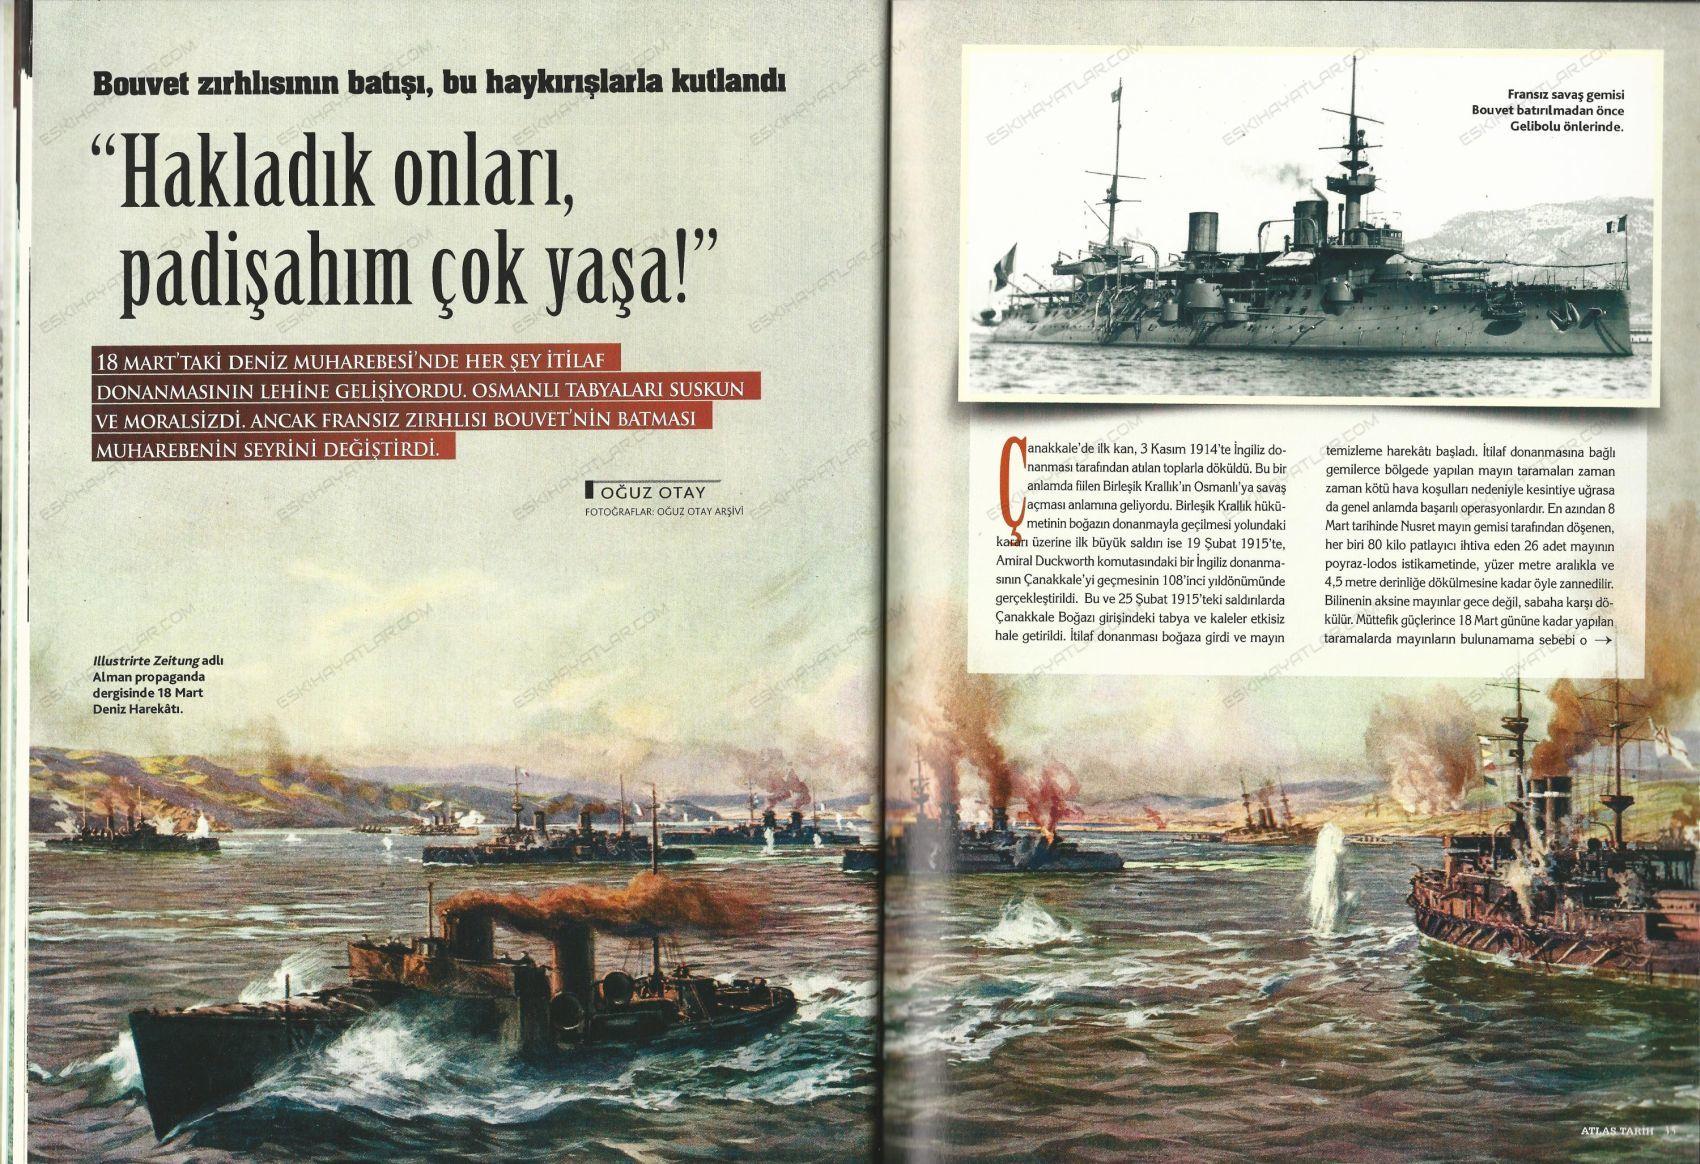 0333-18-mart-1915-deniz-harekati-bouovet-zirhlisi-atlas-tarih-dergisi-oguz-otay-arsivi-harp-mecmuasi (8)